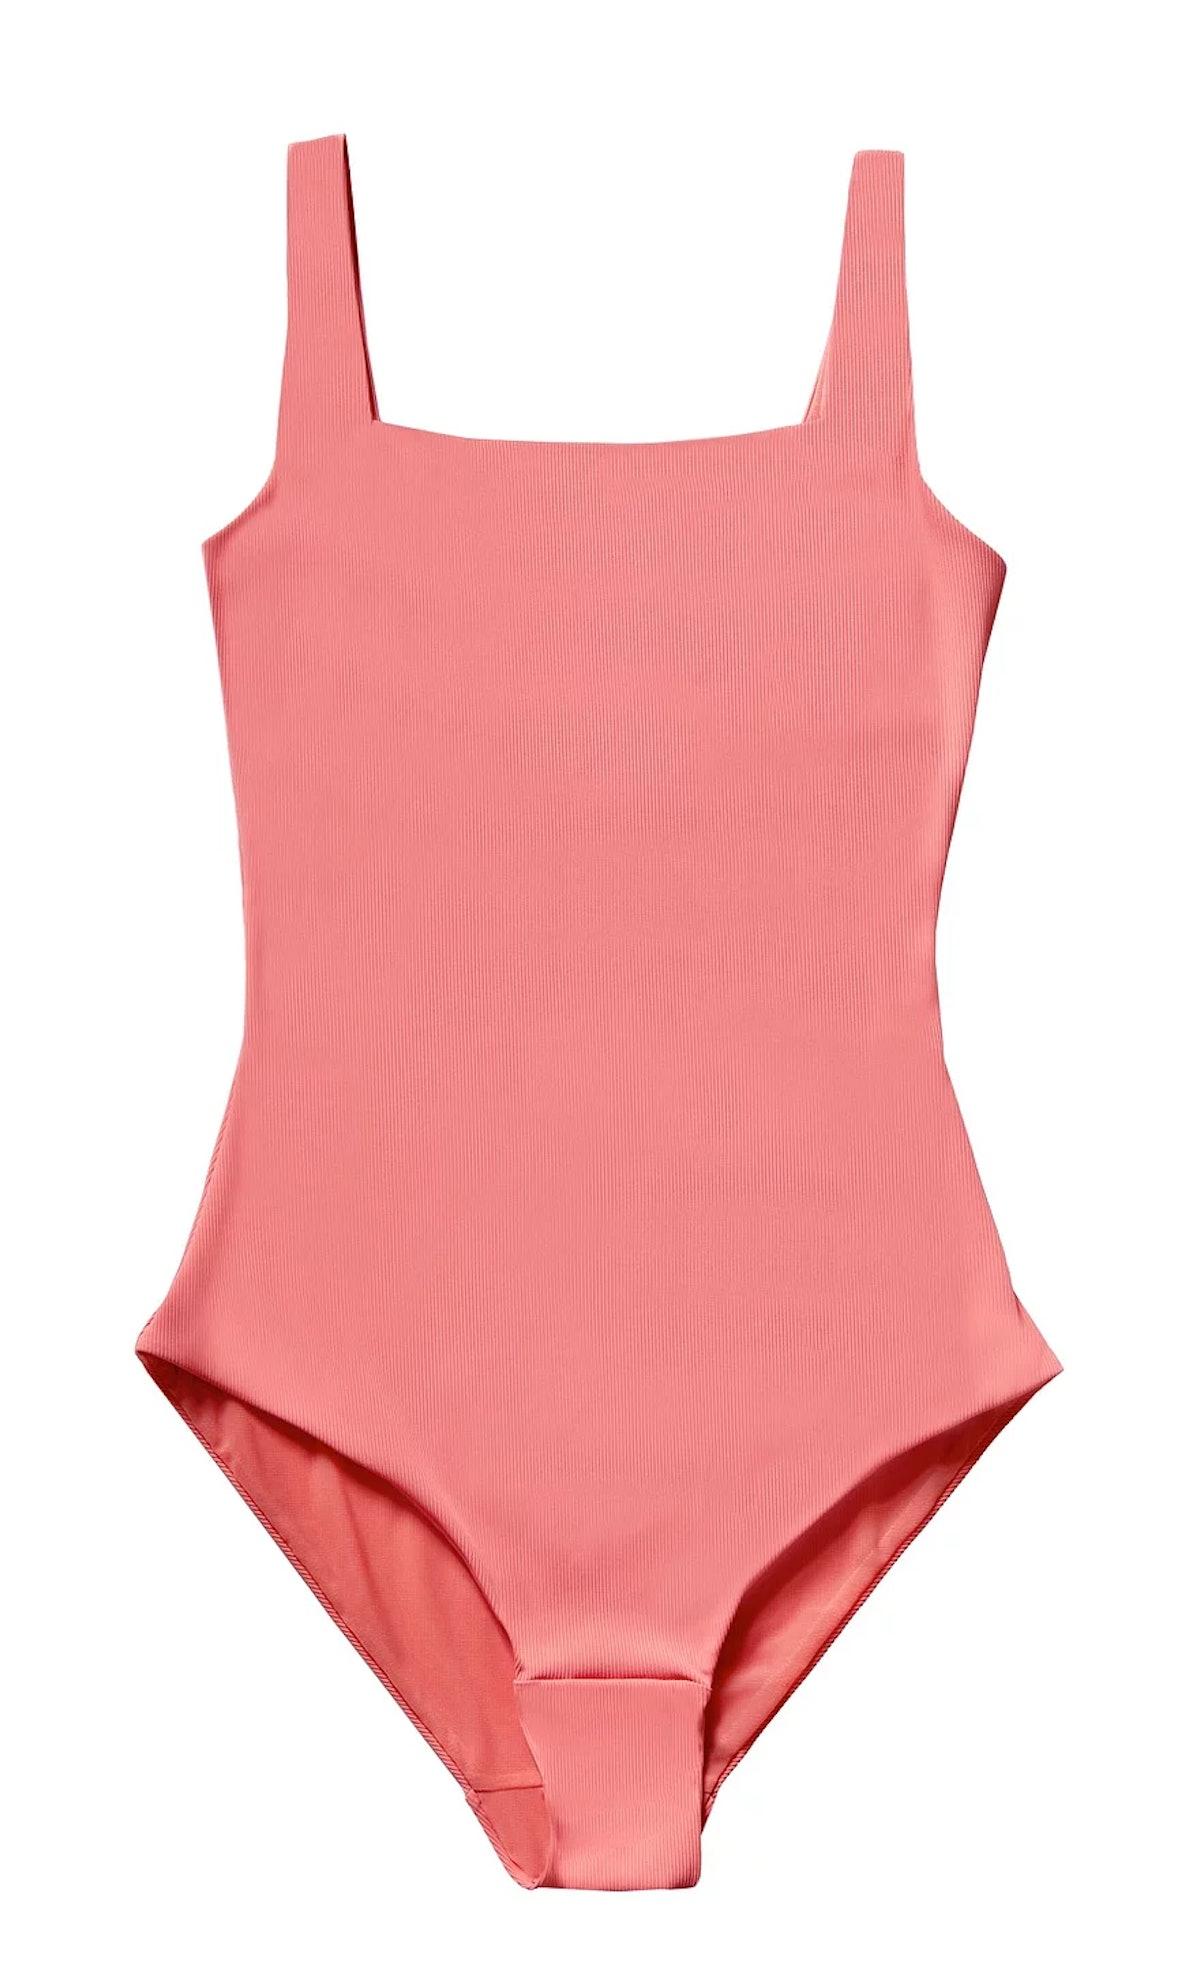 RENDL Swimsuit No.16